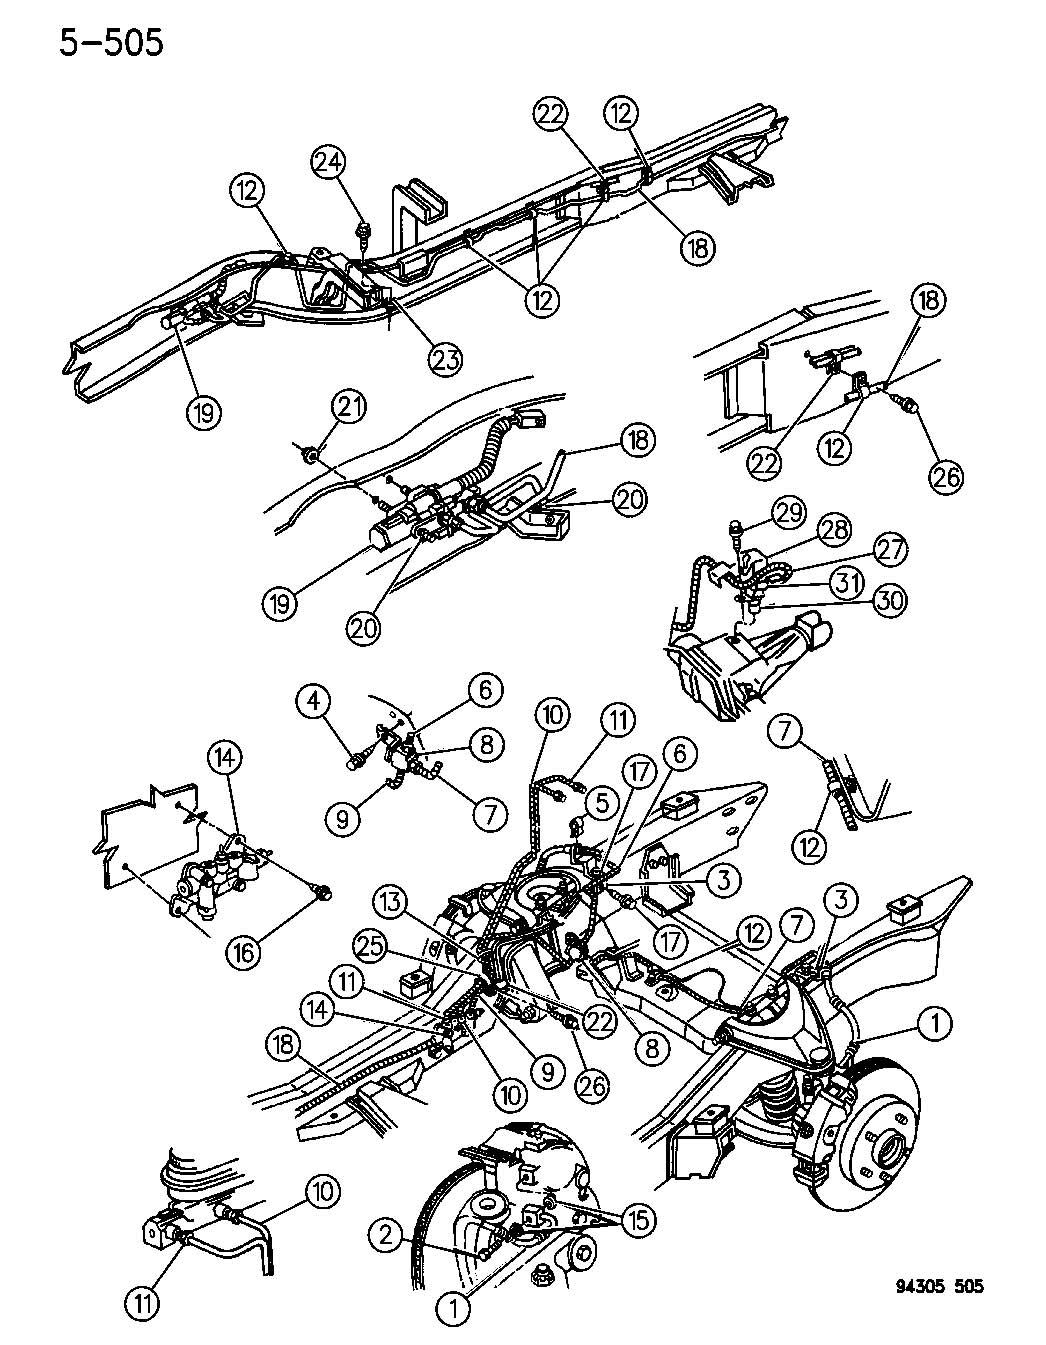 1992 Dodge Dakota Valve assembly, valve assembly, pressure